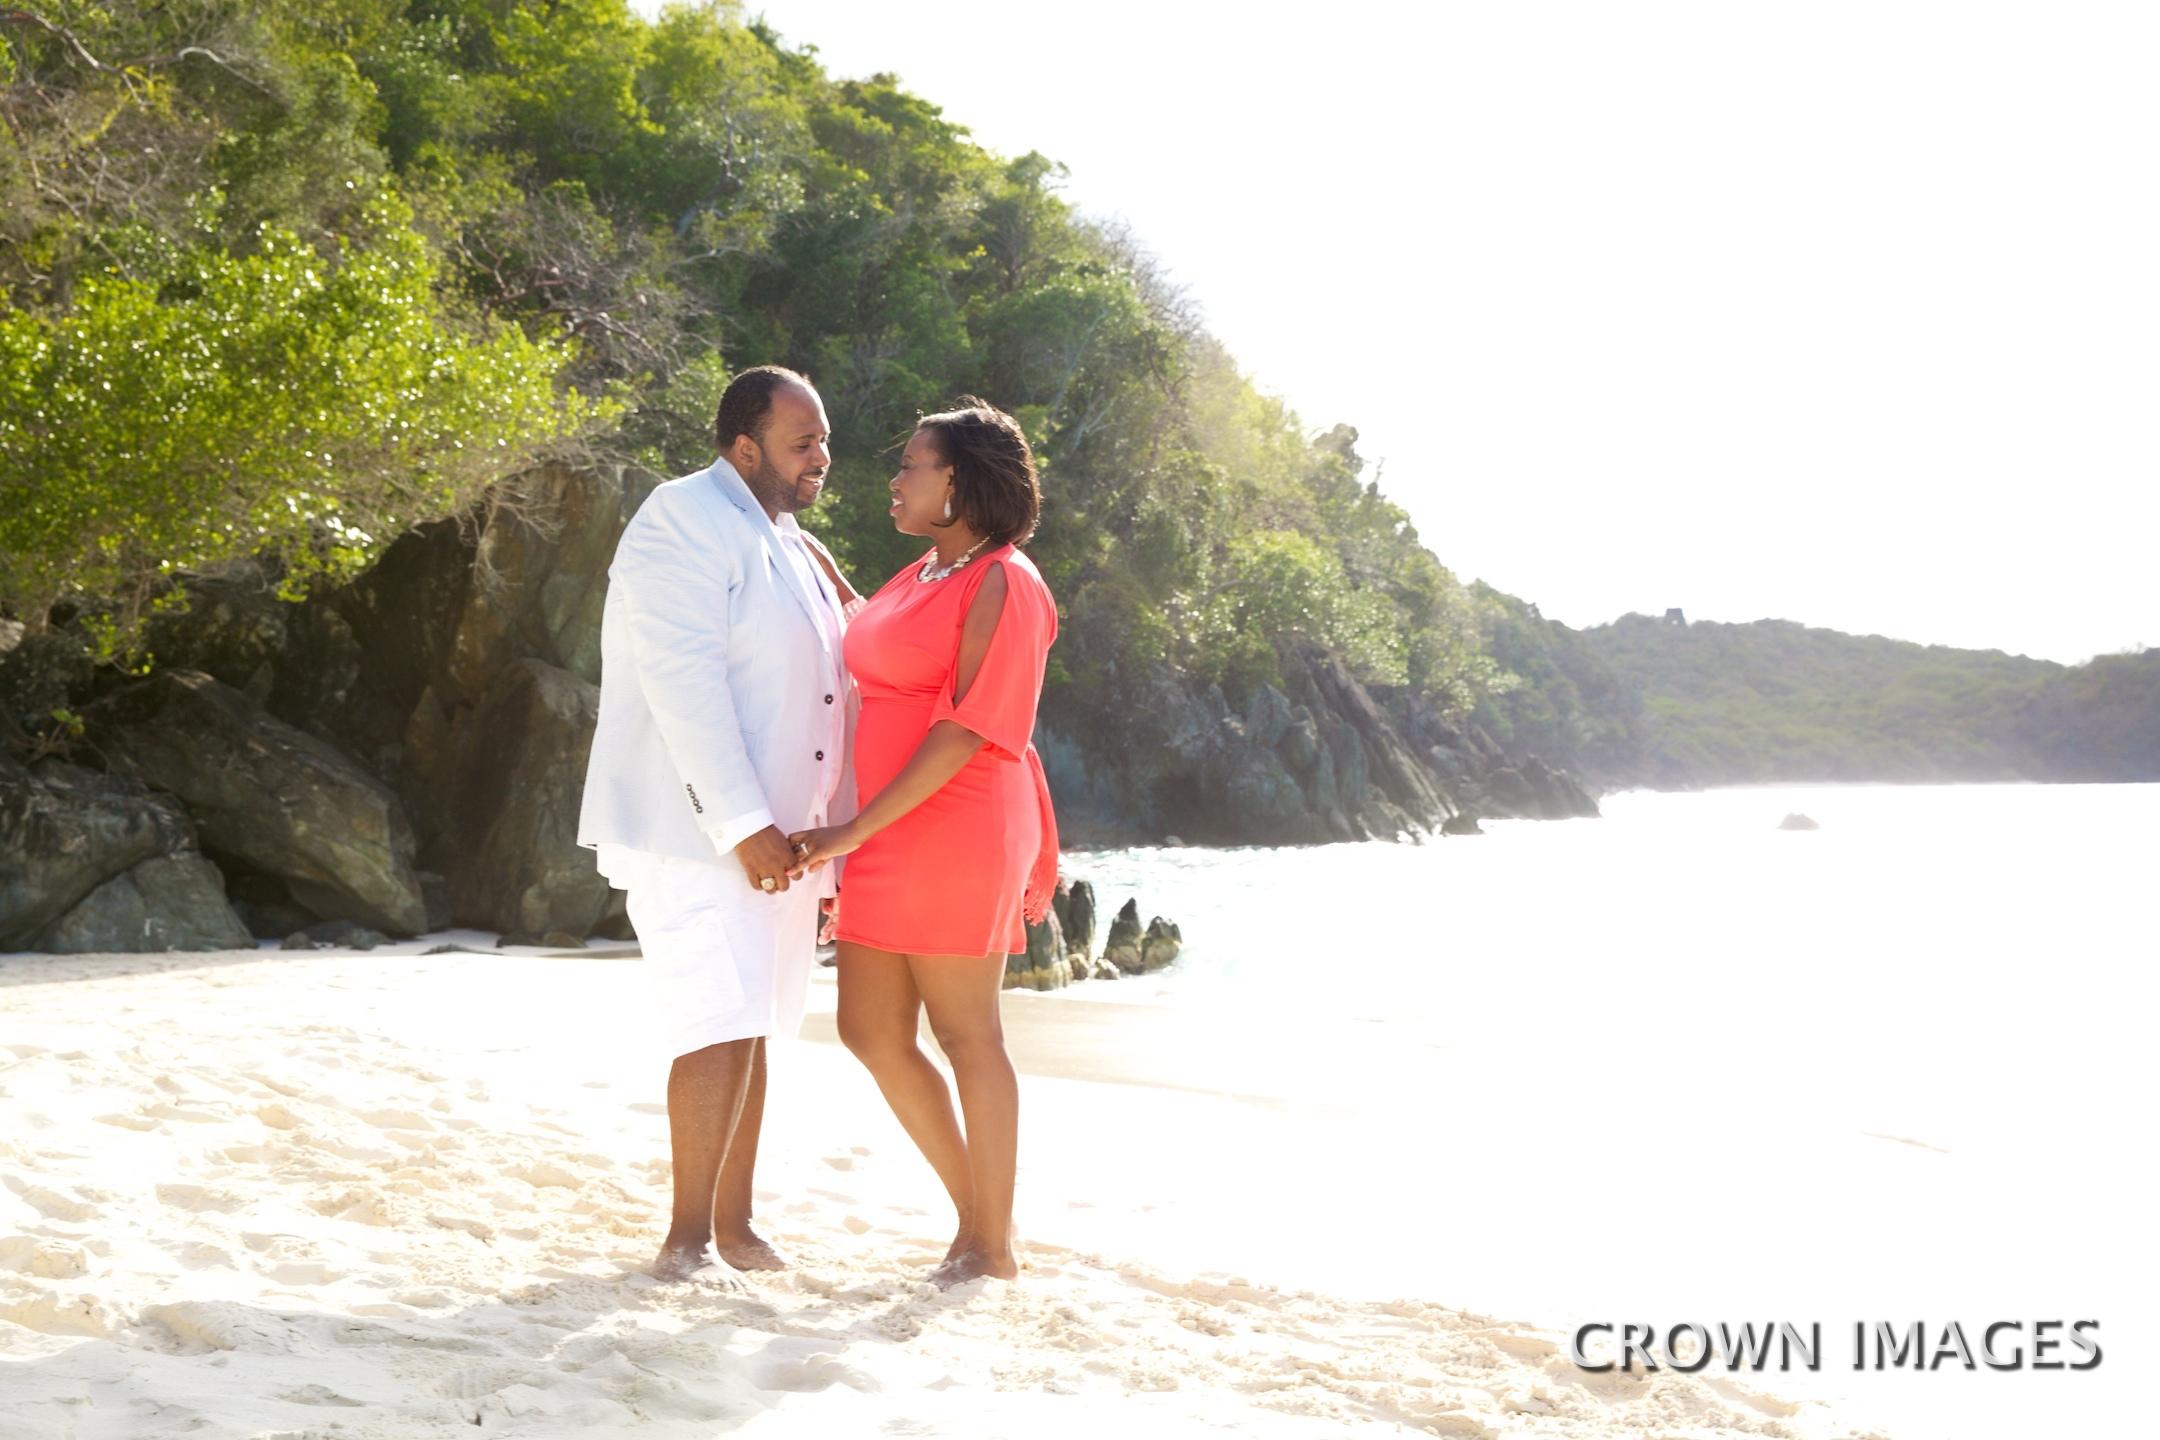 professional photos on the beach